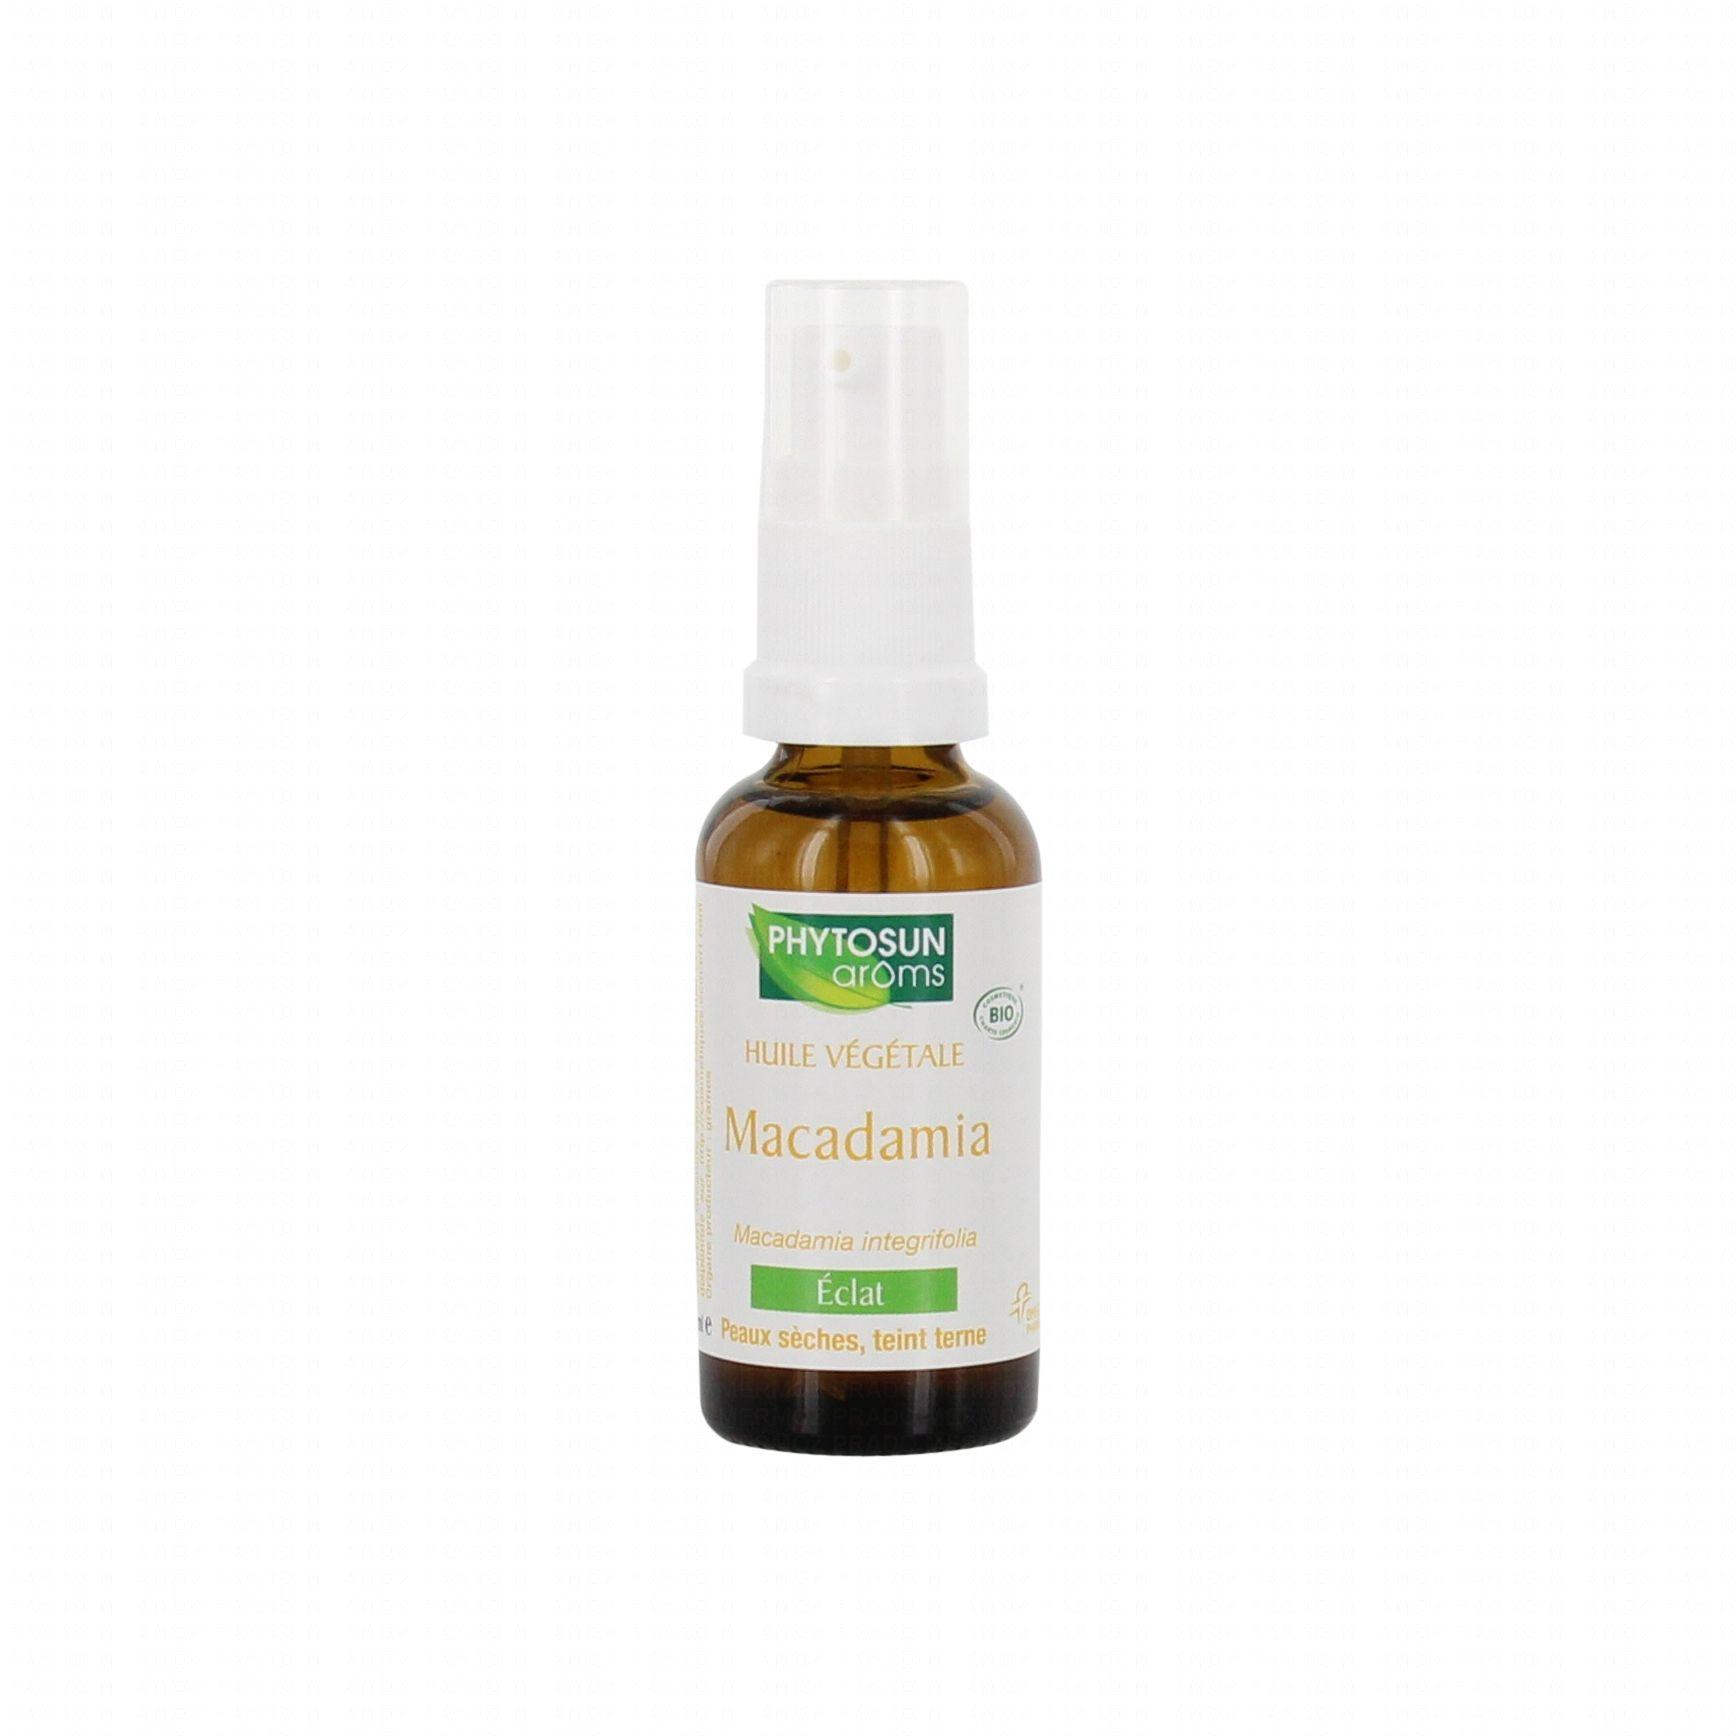 phytosun aroms huile v g tale bio de macadamia flacon 30 ml parapharmacie en ligne prado mermoz. Black Bedroom Furniture Sets. Home Design Ideas